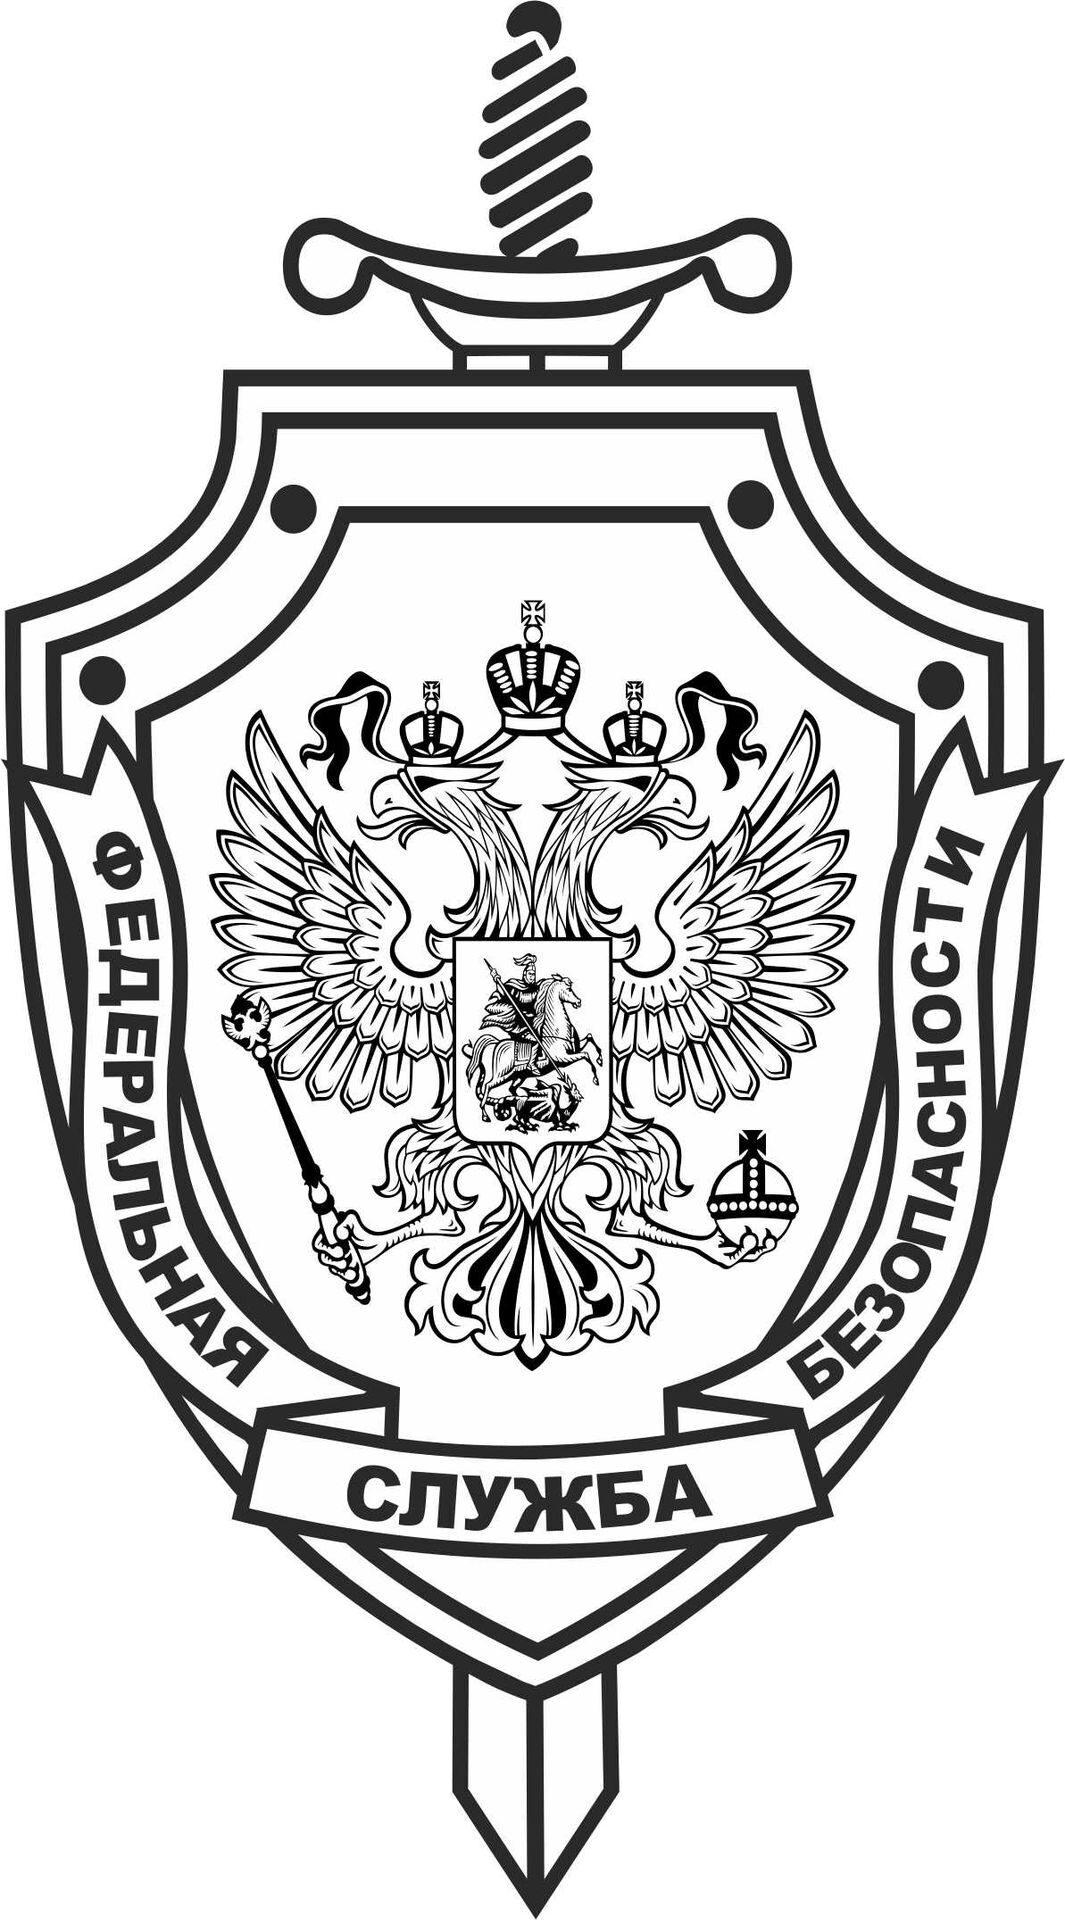 РАЗРАБОТКА ИНТЕРНЕТ МАГАЗИНА БАРНАУЛ